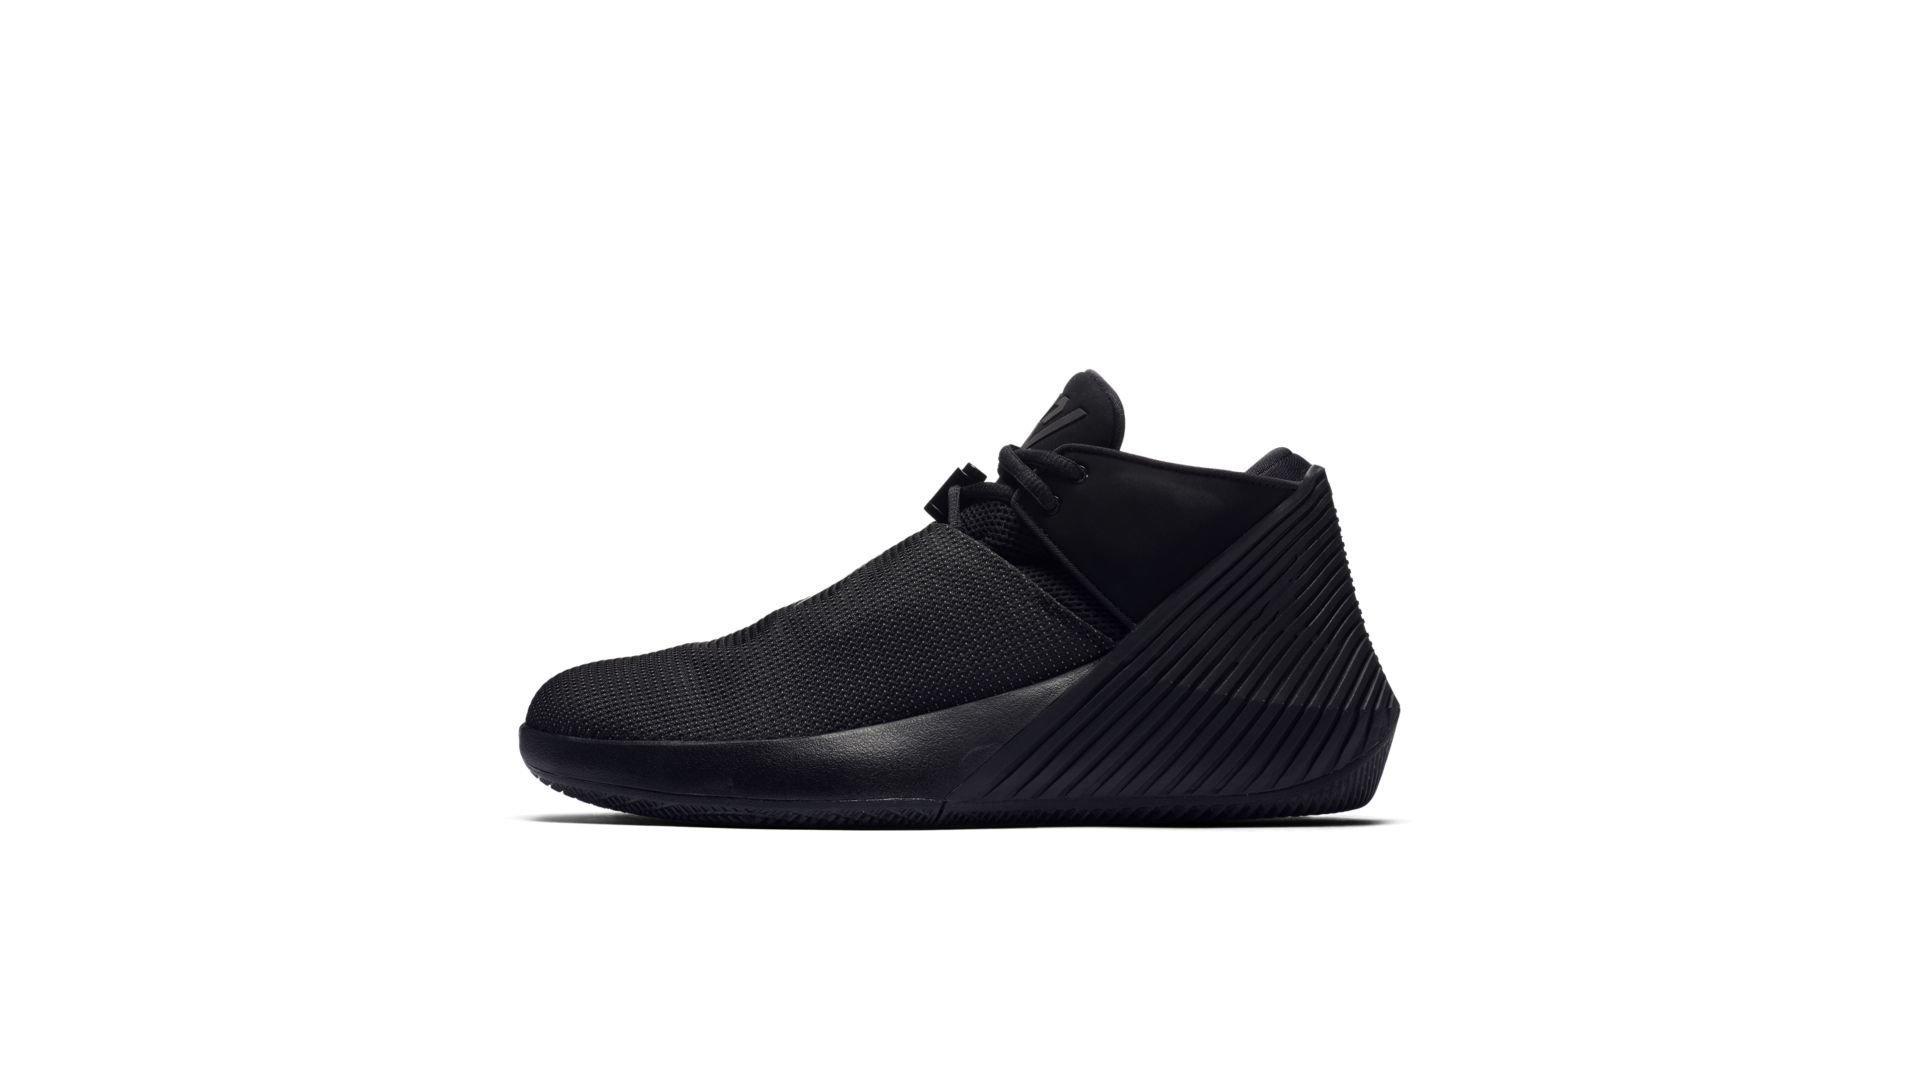 Jordan Why Not Zer0.1 Low Black (AR0043-001)